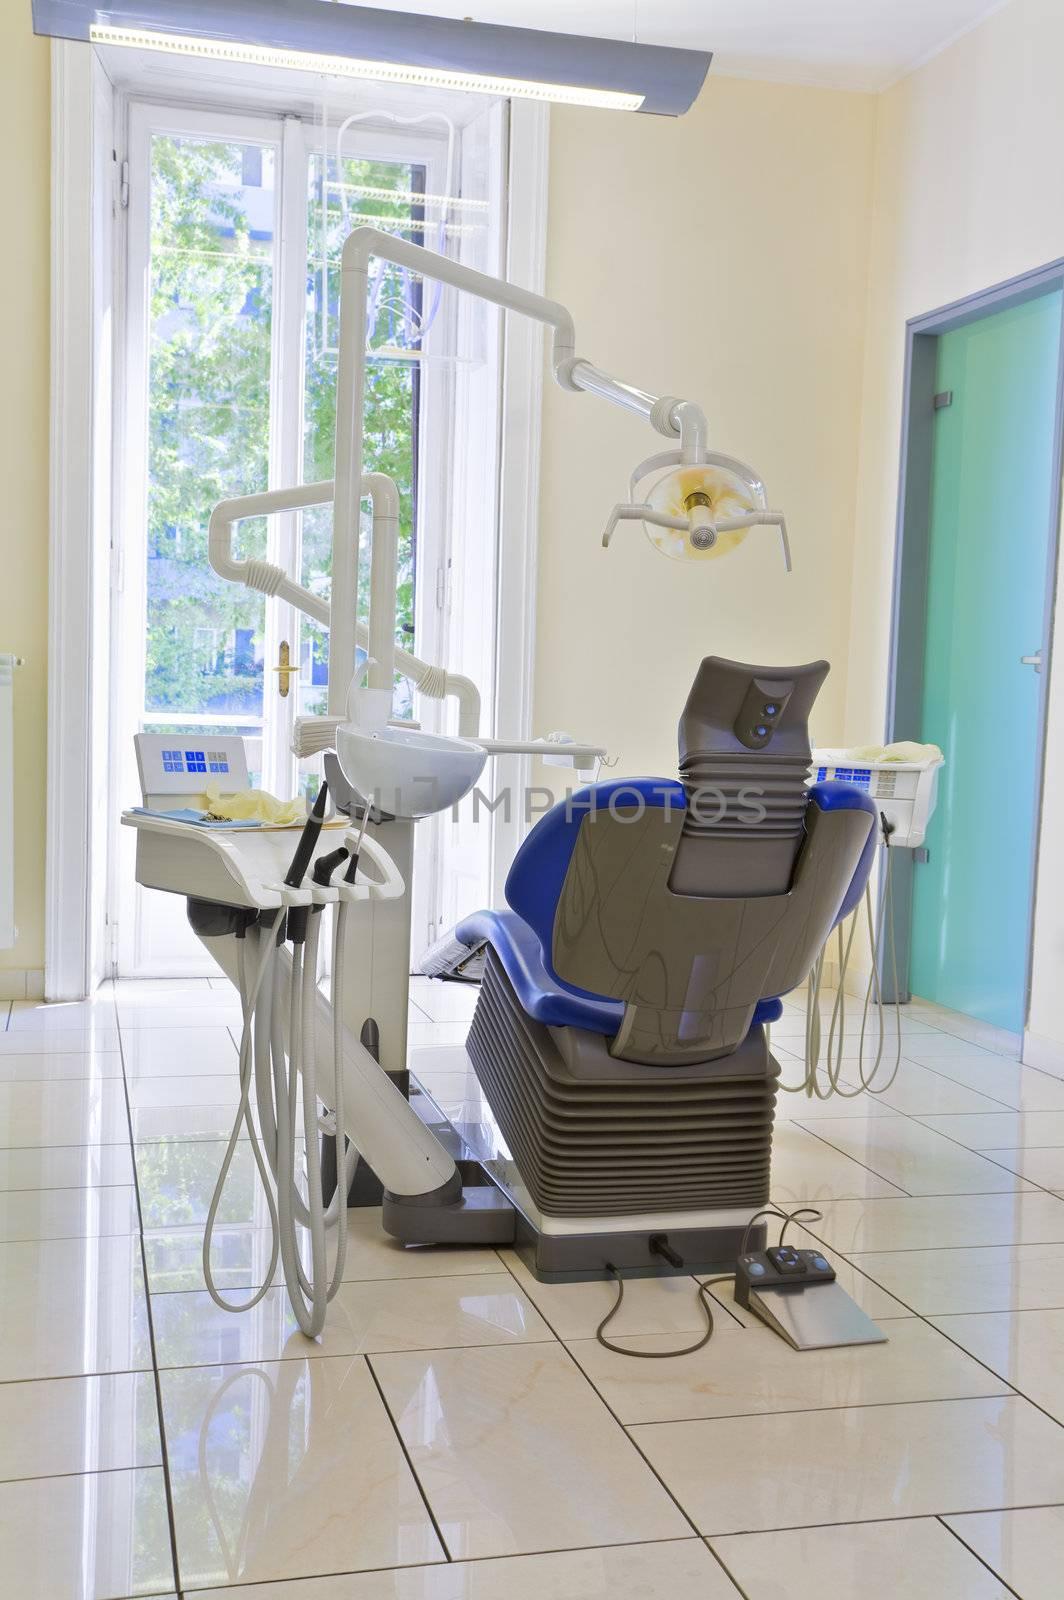 dentist by diego_cervo